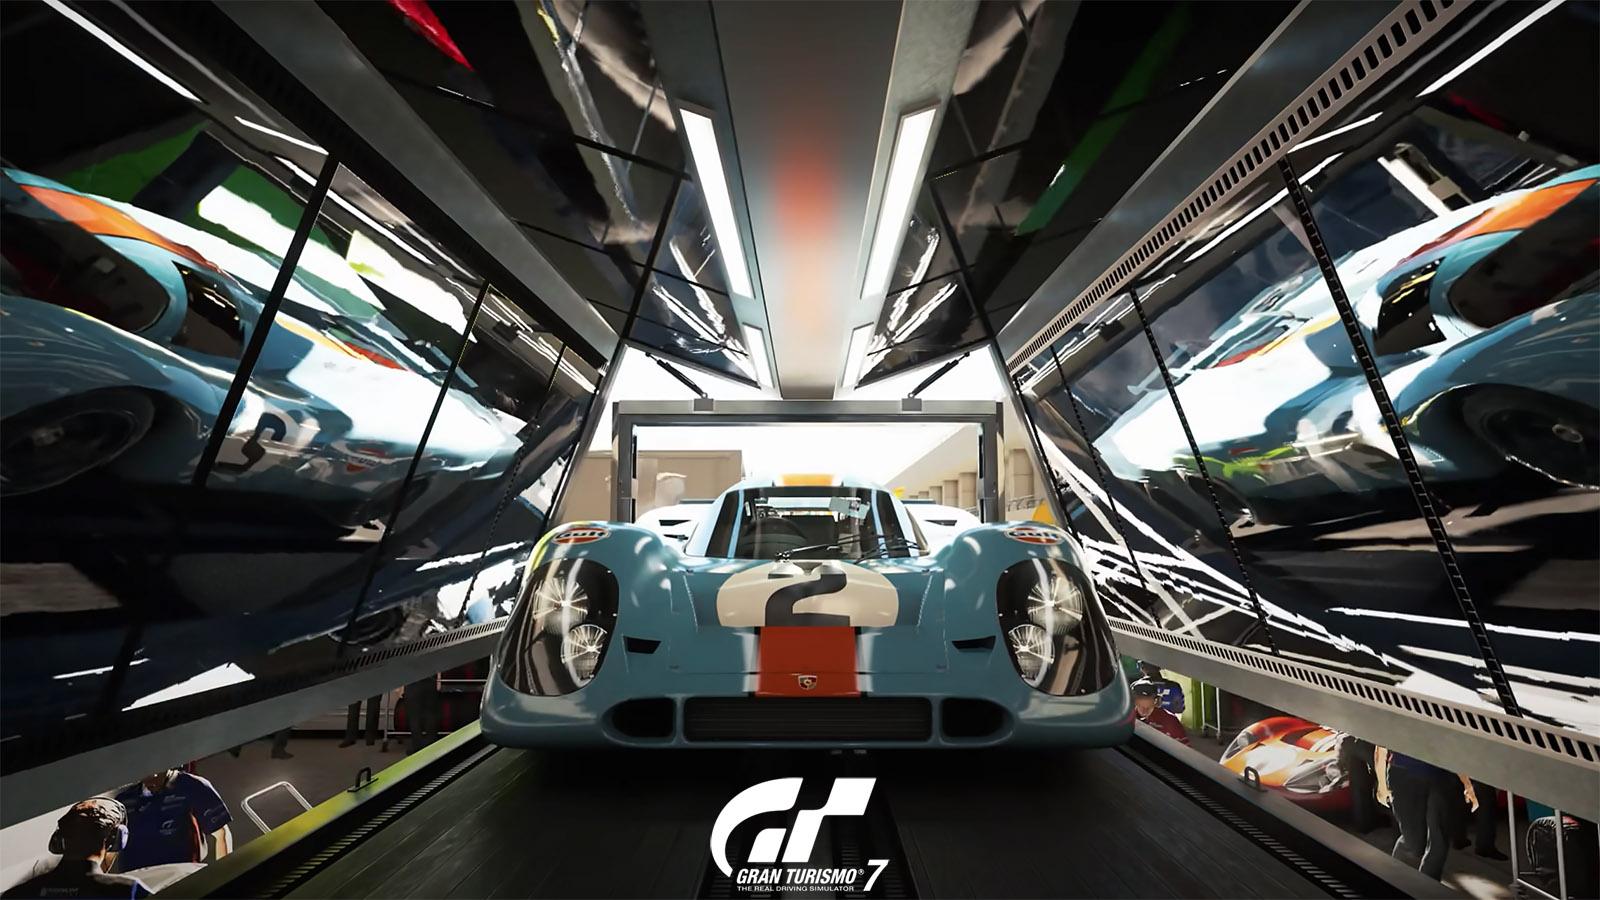 Gran Turismo 7 confirmed cars list